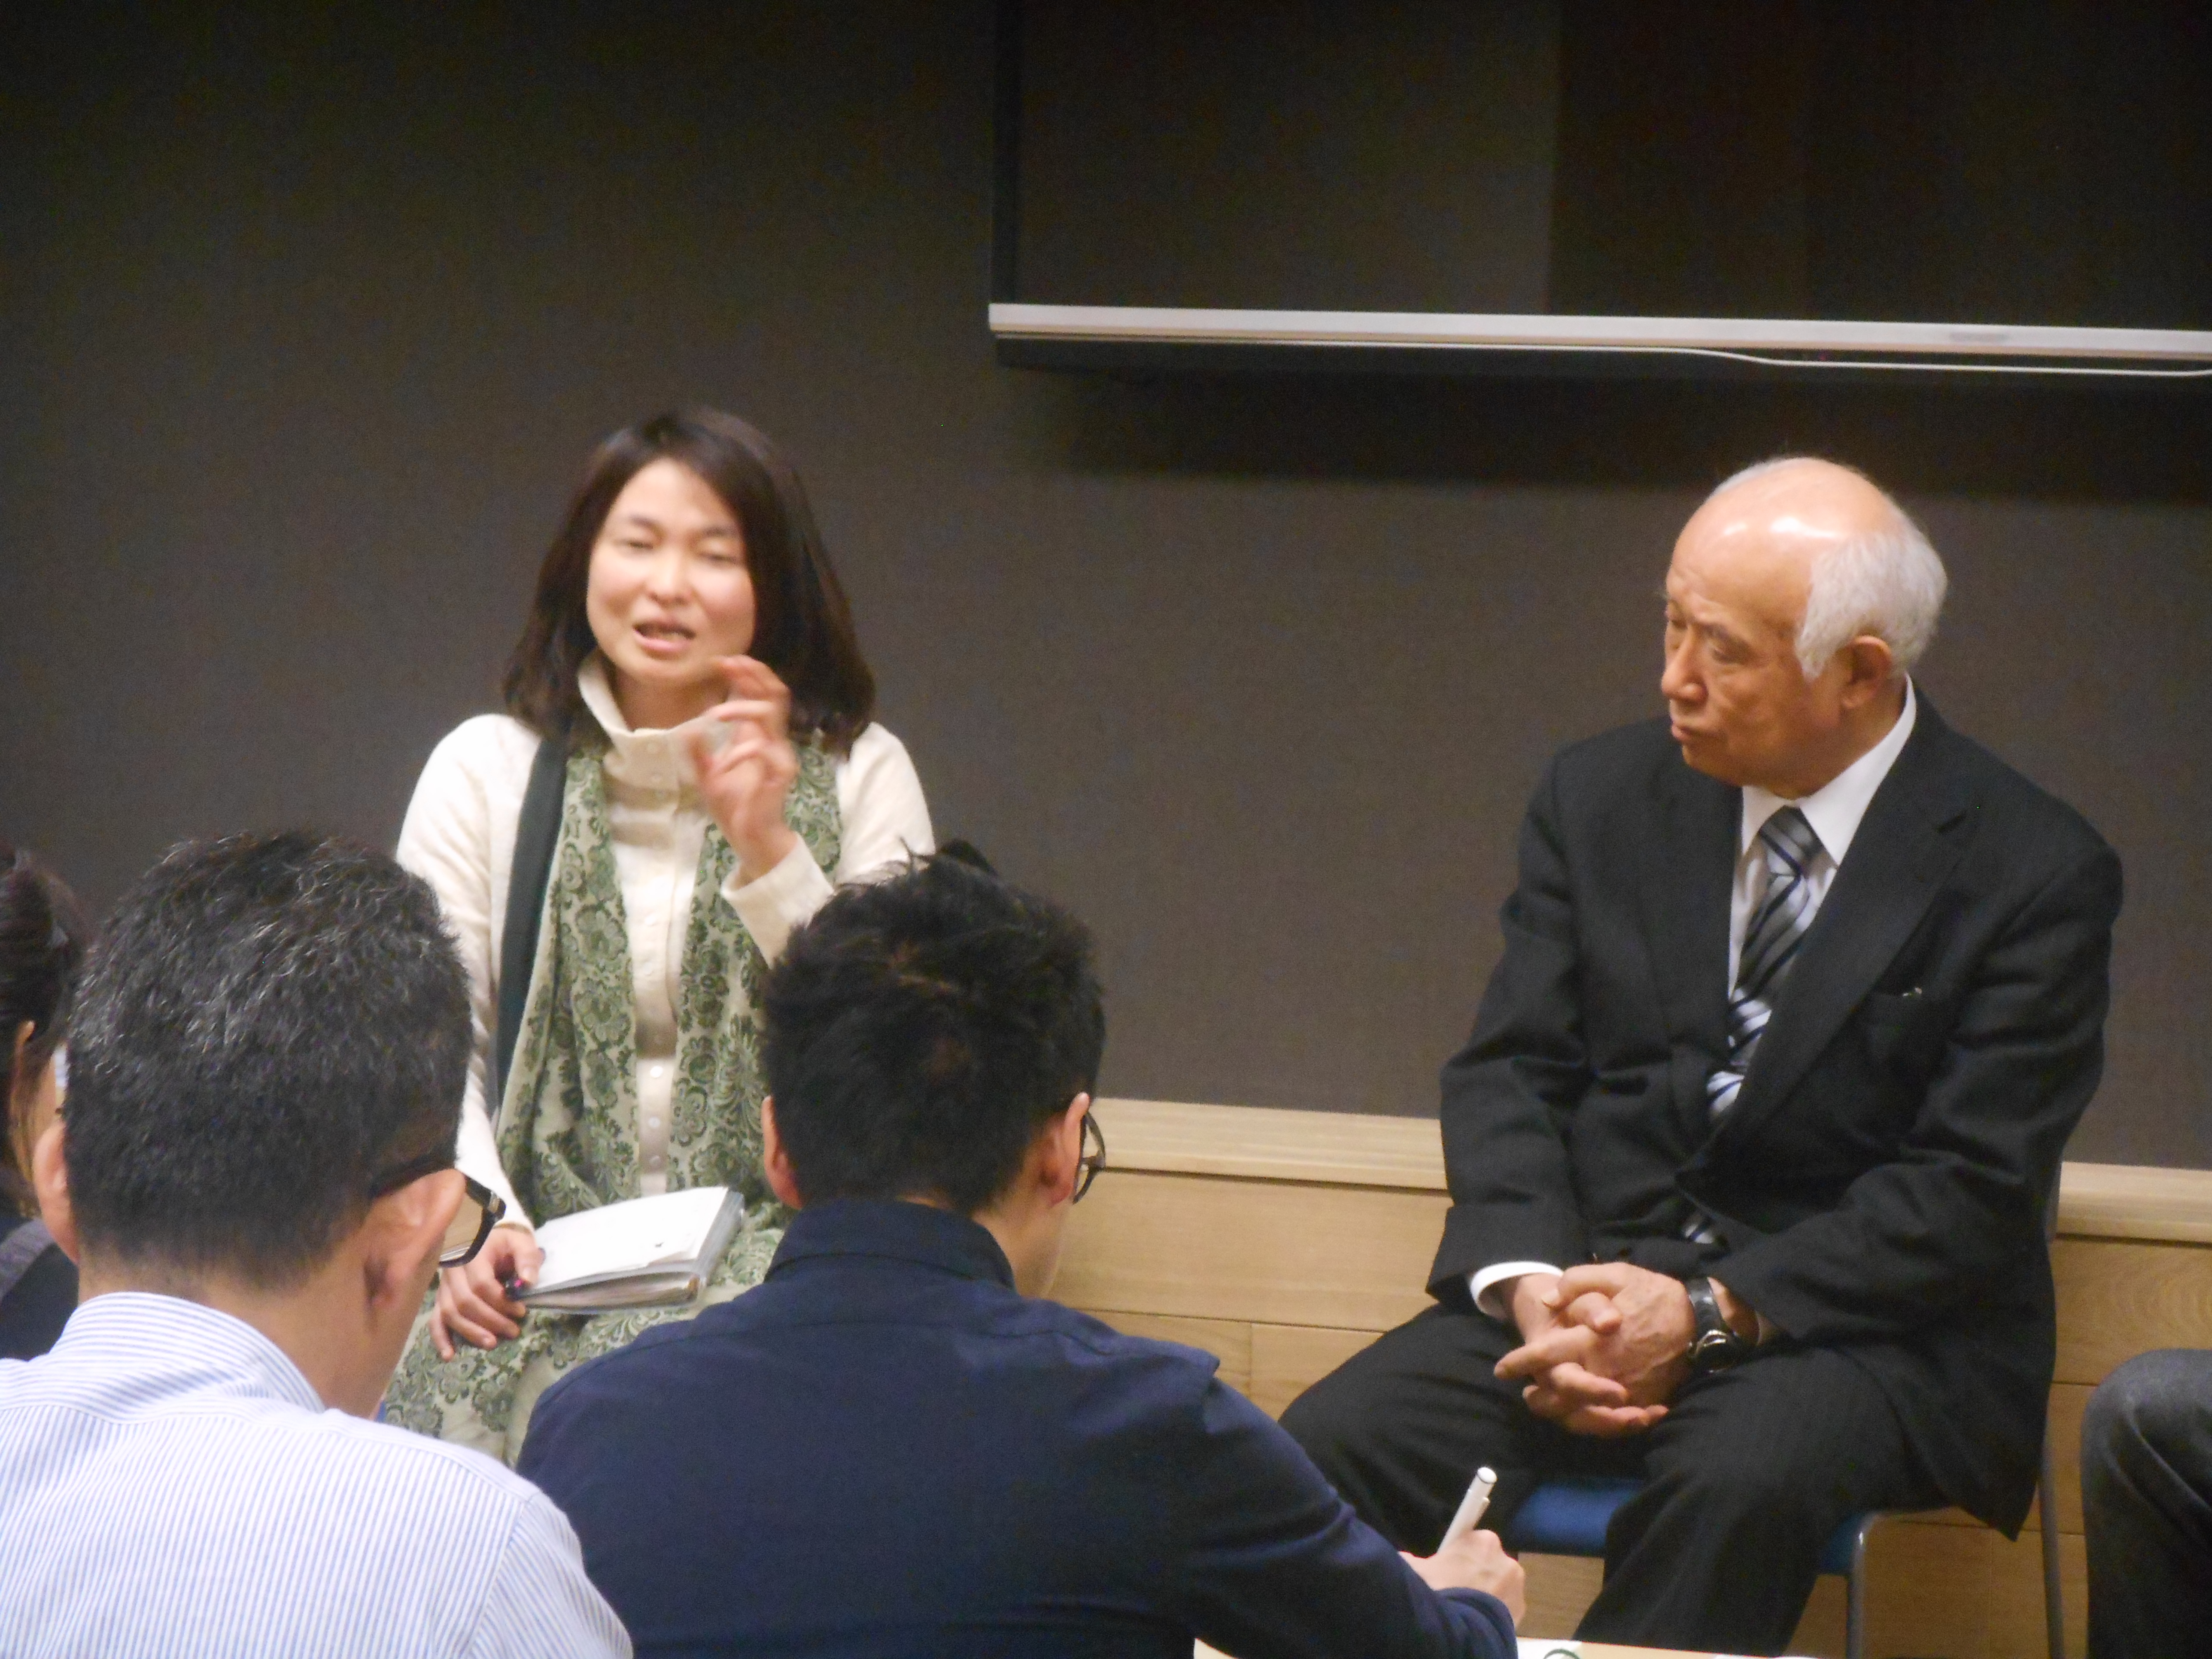 DSCN0490 - 平成30年度 東京思風塾 4月7日(土)「時代が問題をつくり、問題が人物をつくる」